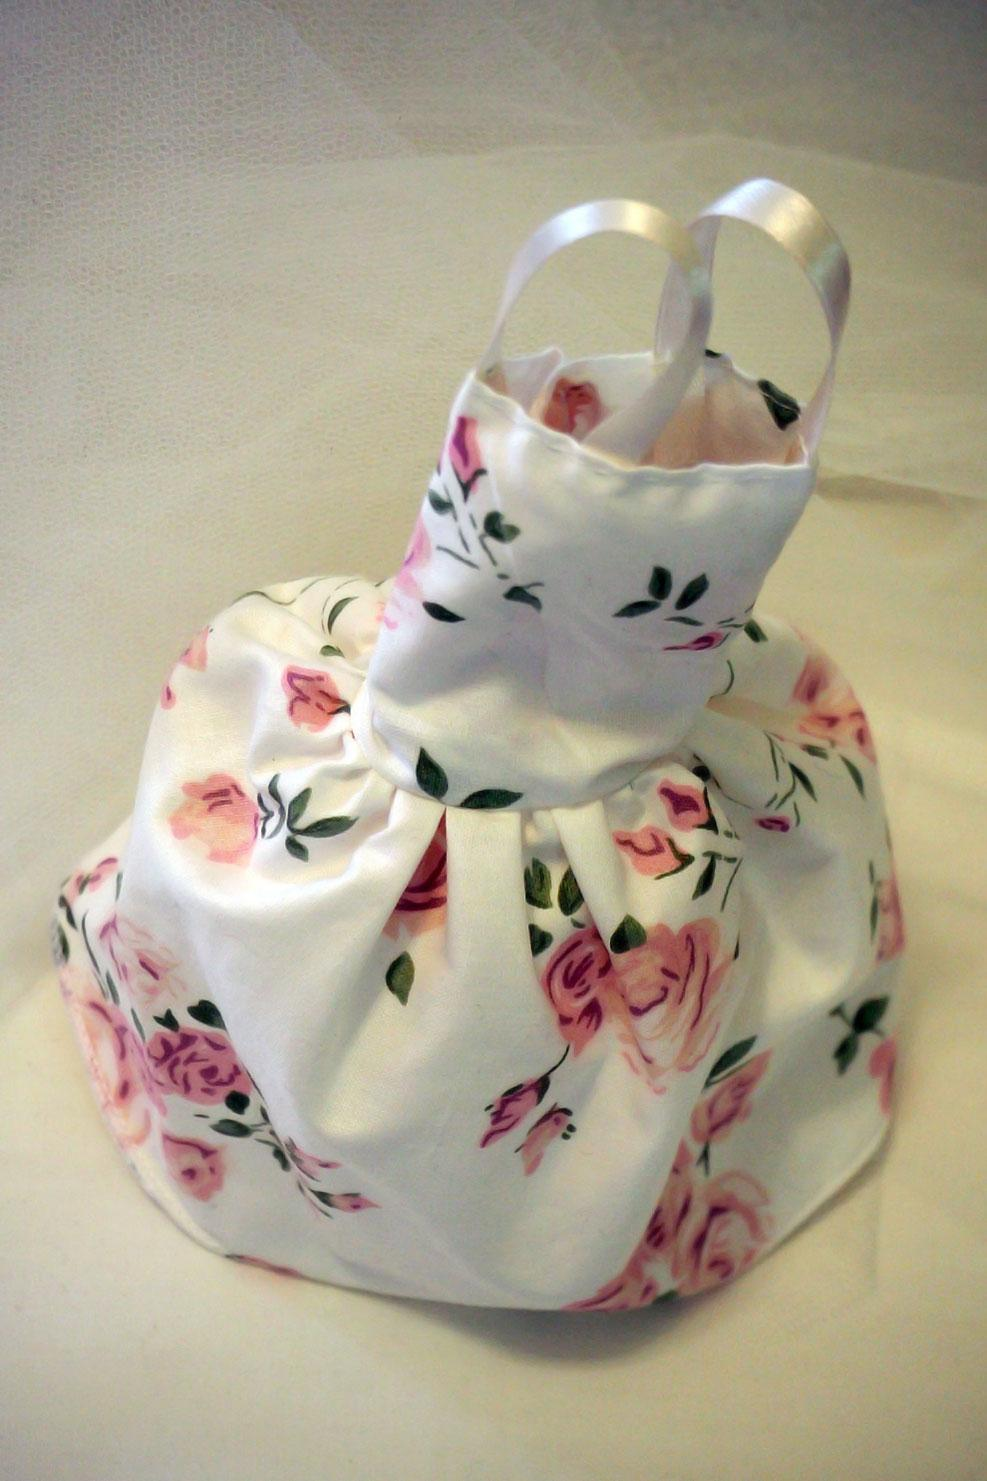 Vintage μπομπονιέρα βάπτισης με λουλουδάτο φόρεμα για κορίτσια